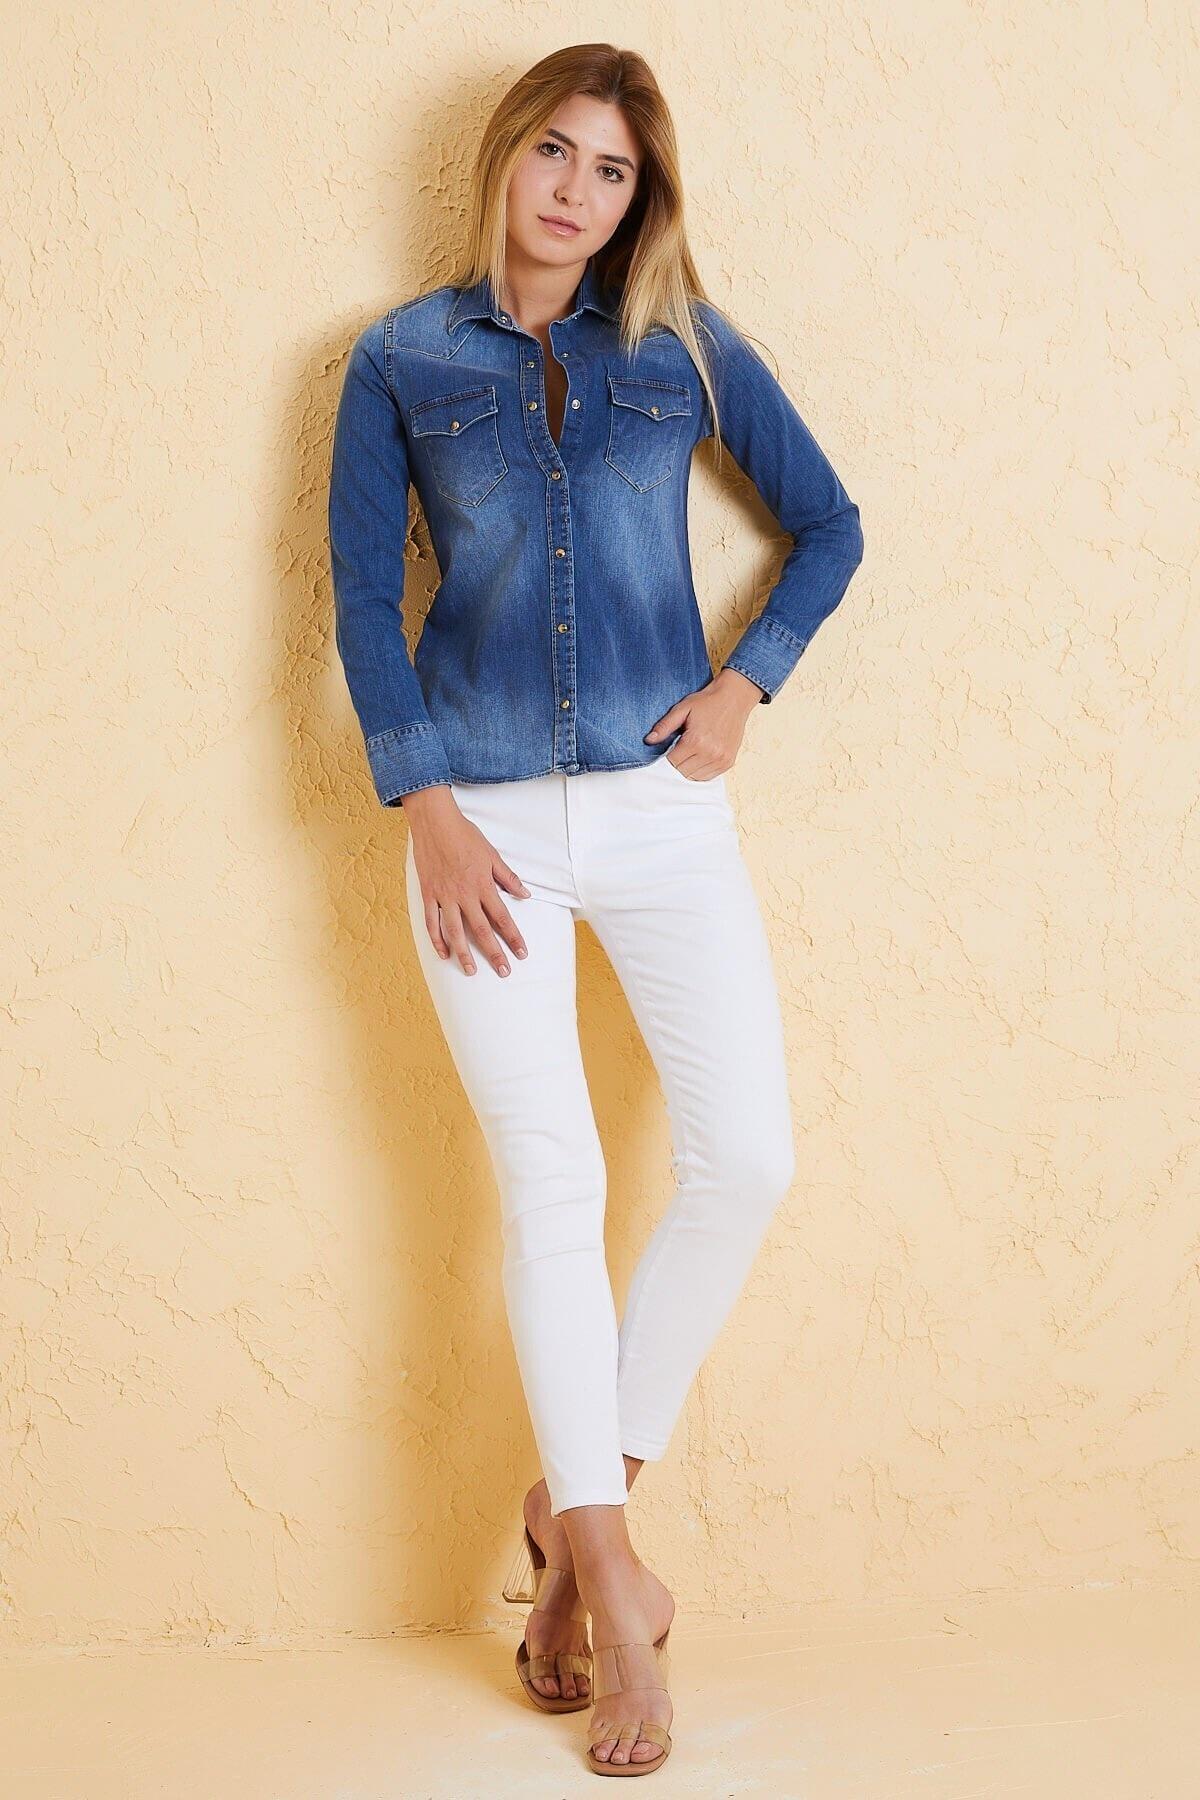 Twister Jeans Kadın Slim Fit Gömlek Bg 812-03 A.mavı 2